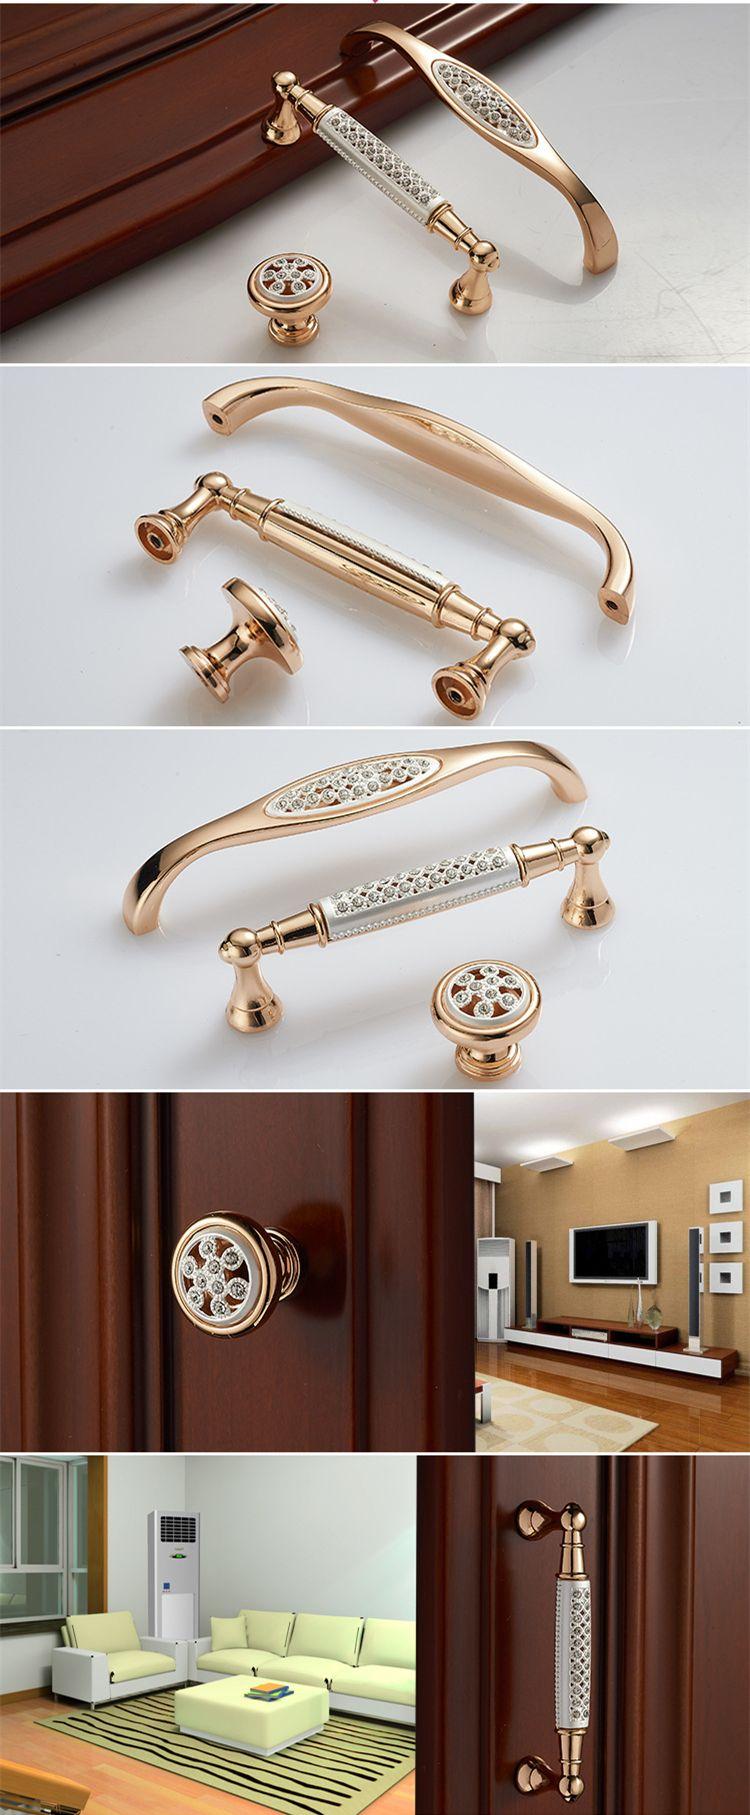 Pin On Cabinet Furniture Knobs Handles Drawer Pulls